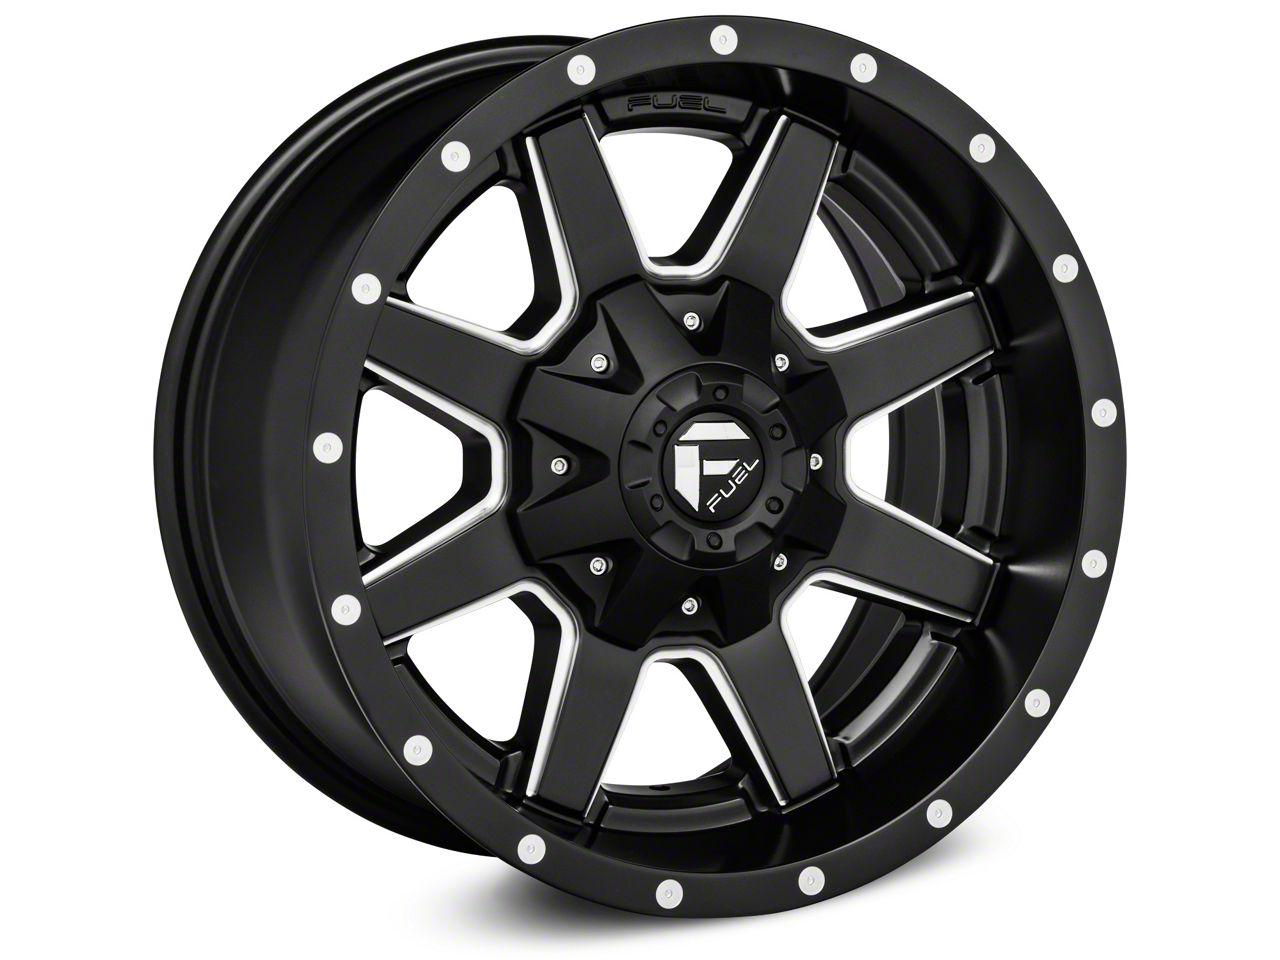 Fuel Wheels Maverick Black Milled Wheel - 17x8.5 (18-19 Jeep Wrangler JL)